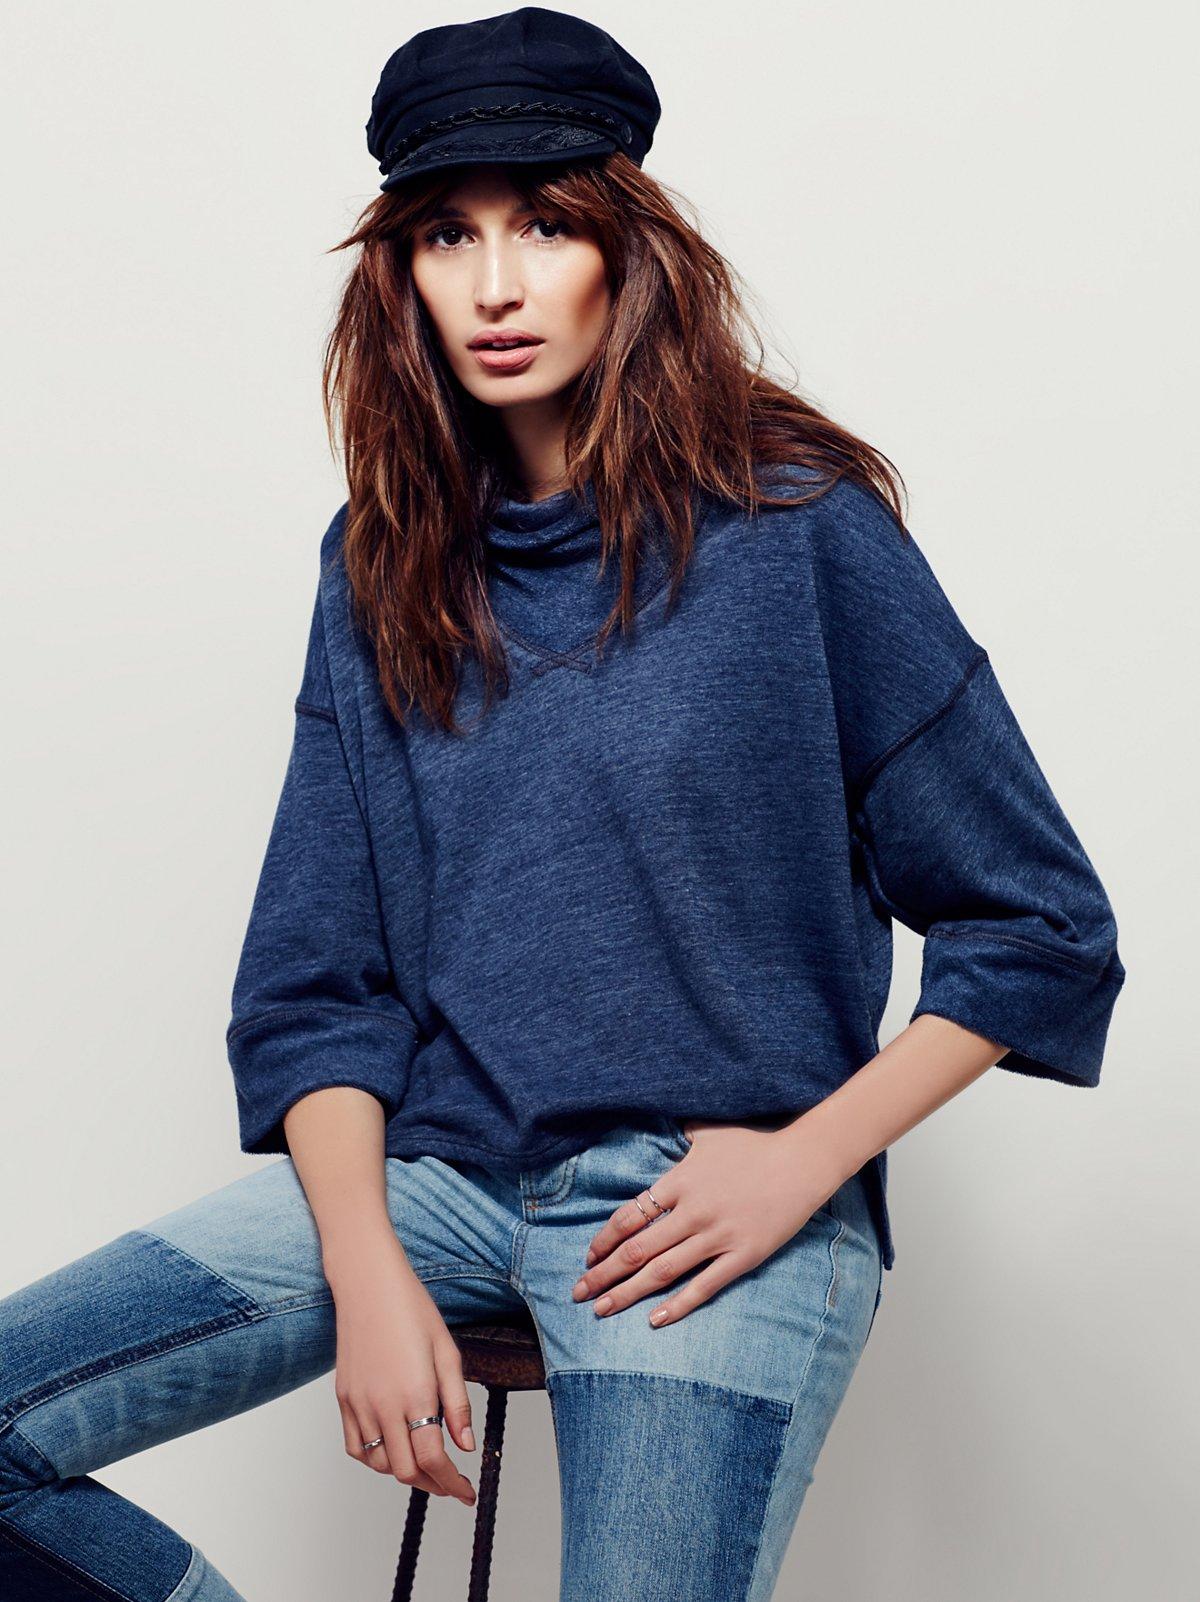 Coziest Cocoon Pullover